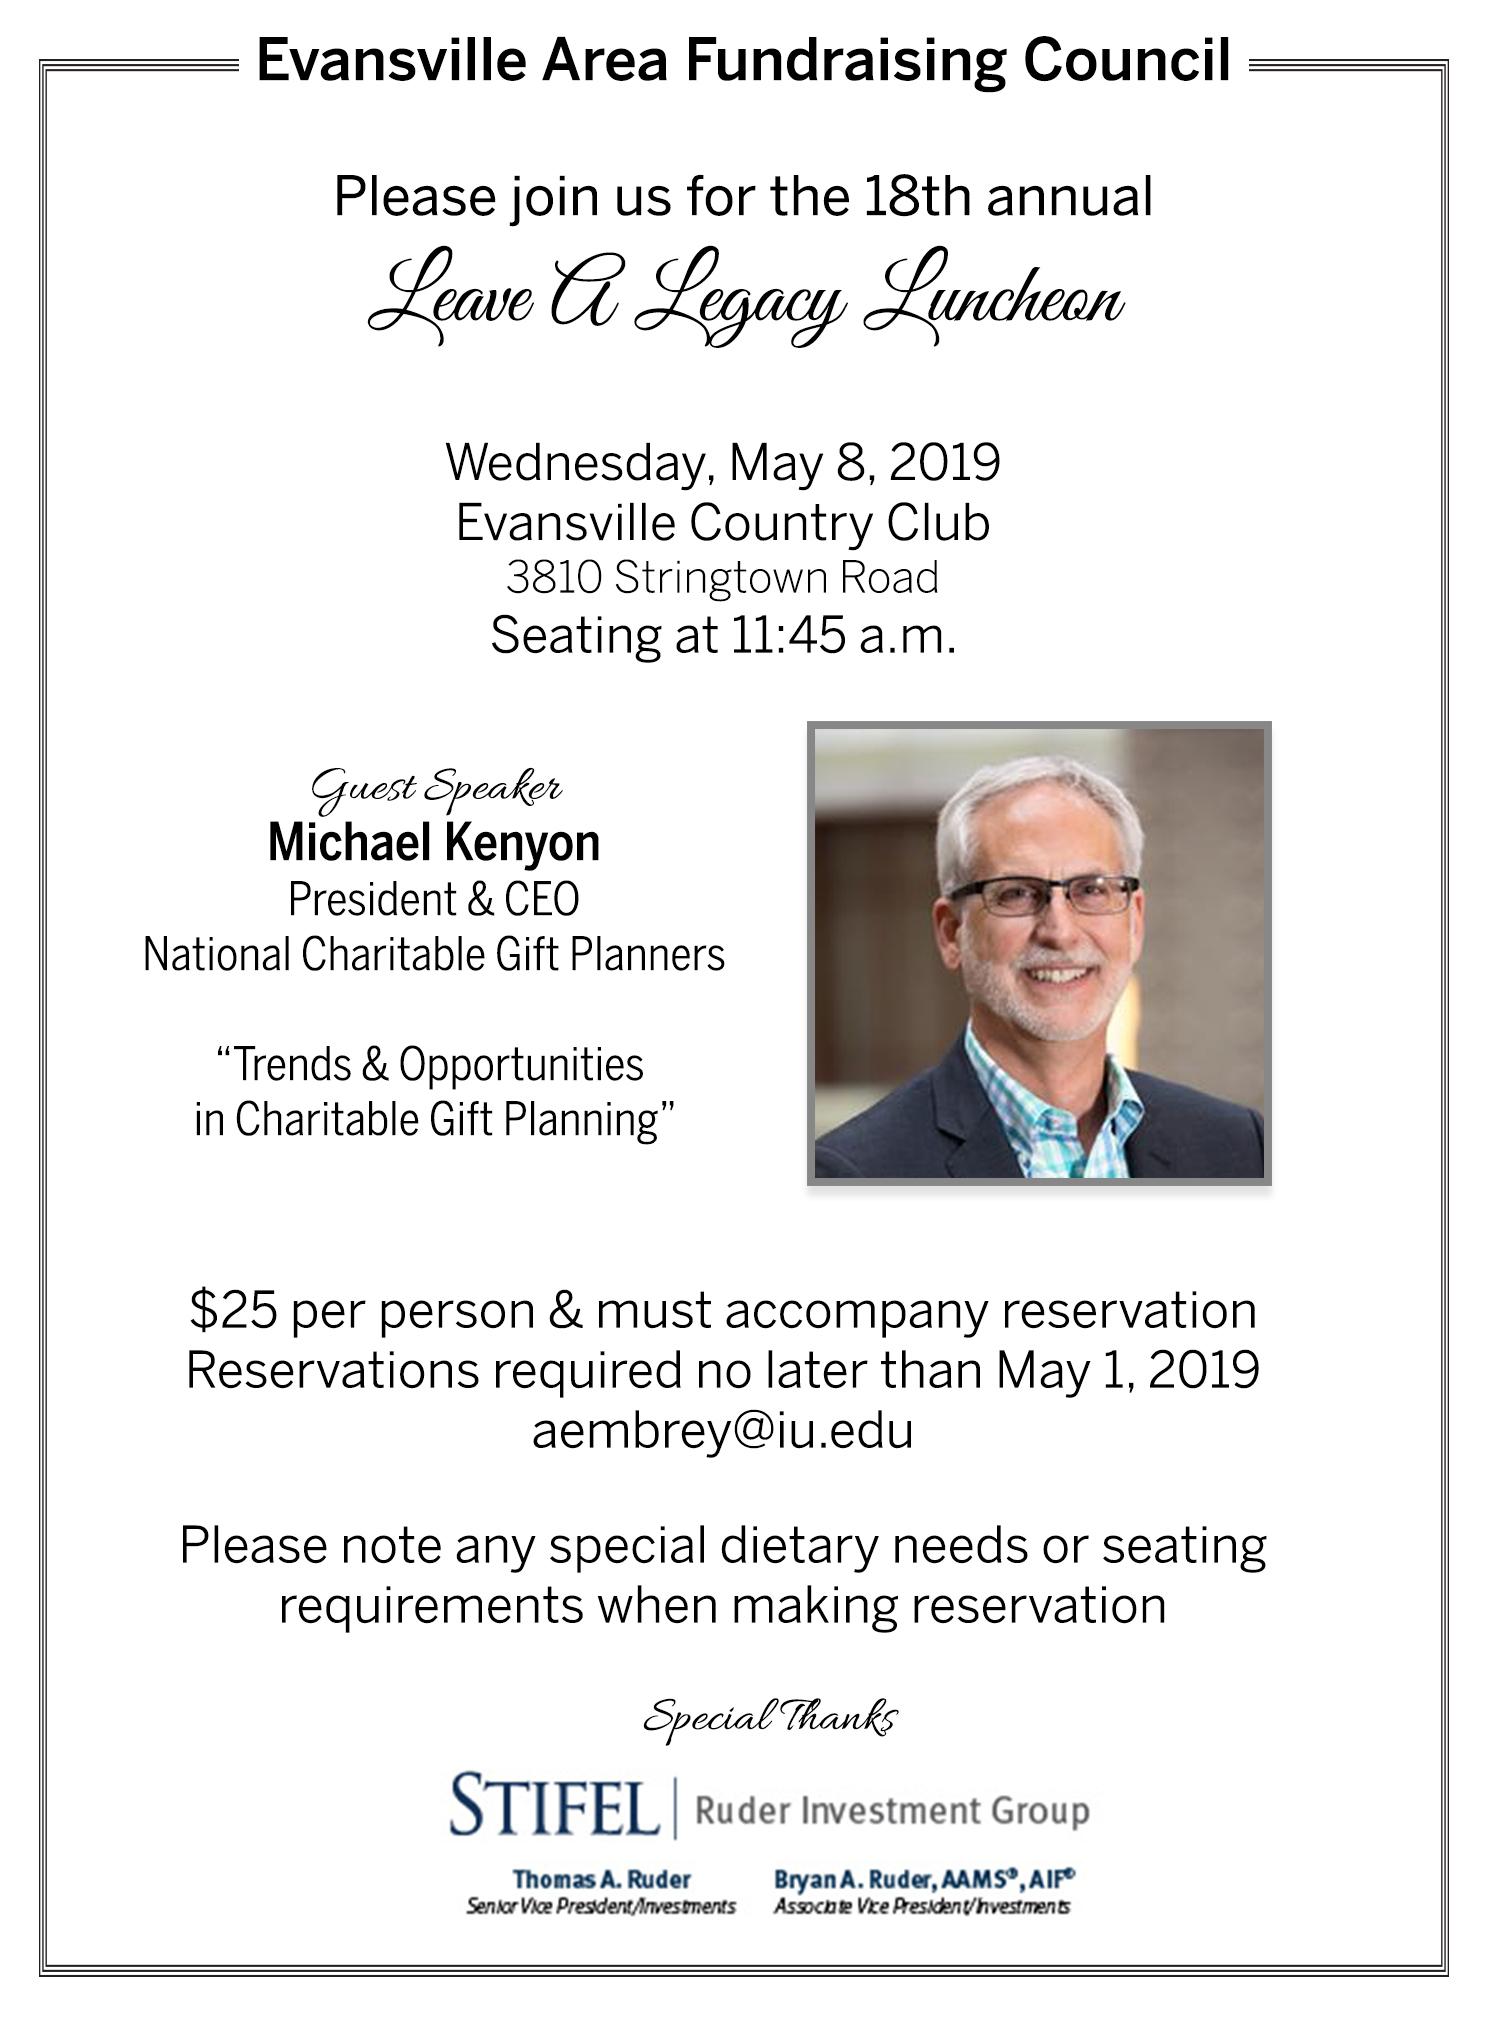 Leave a Legacy Digital Invitation for website.jpg